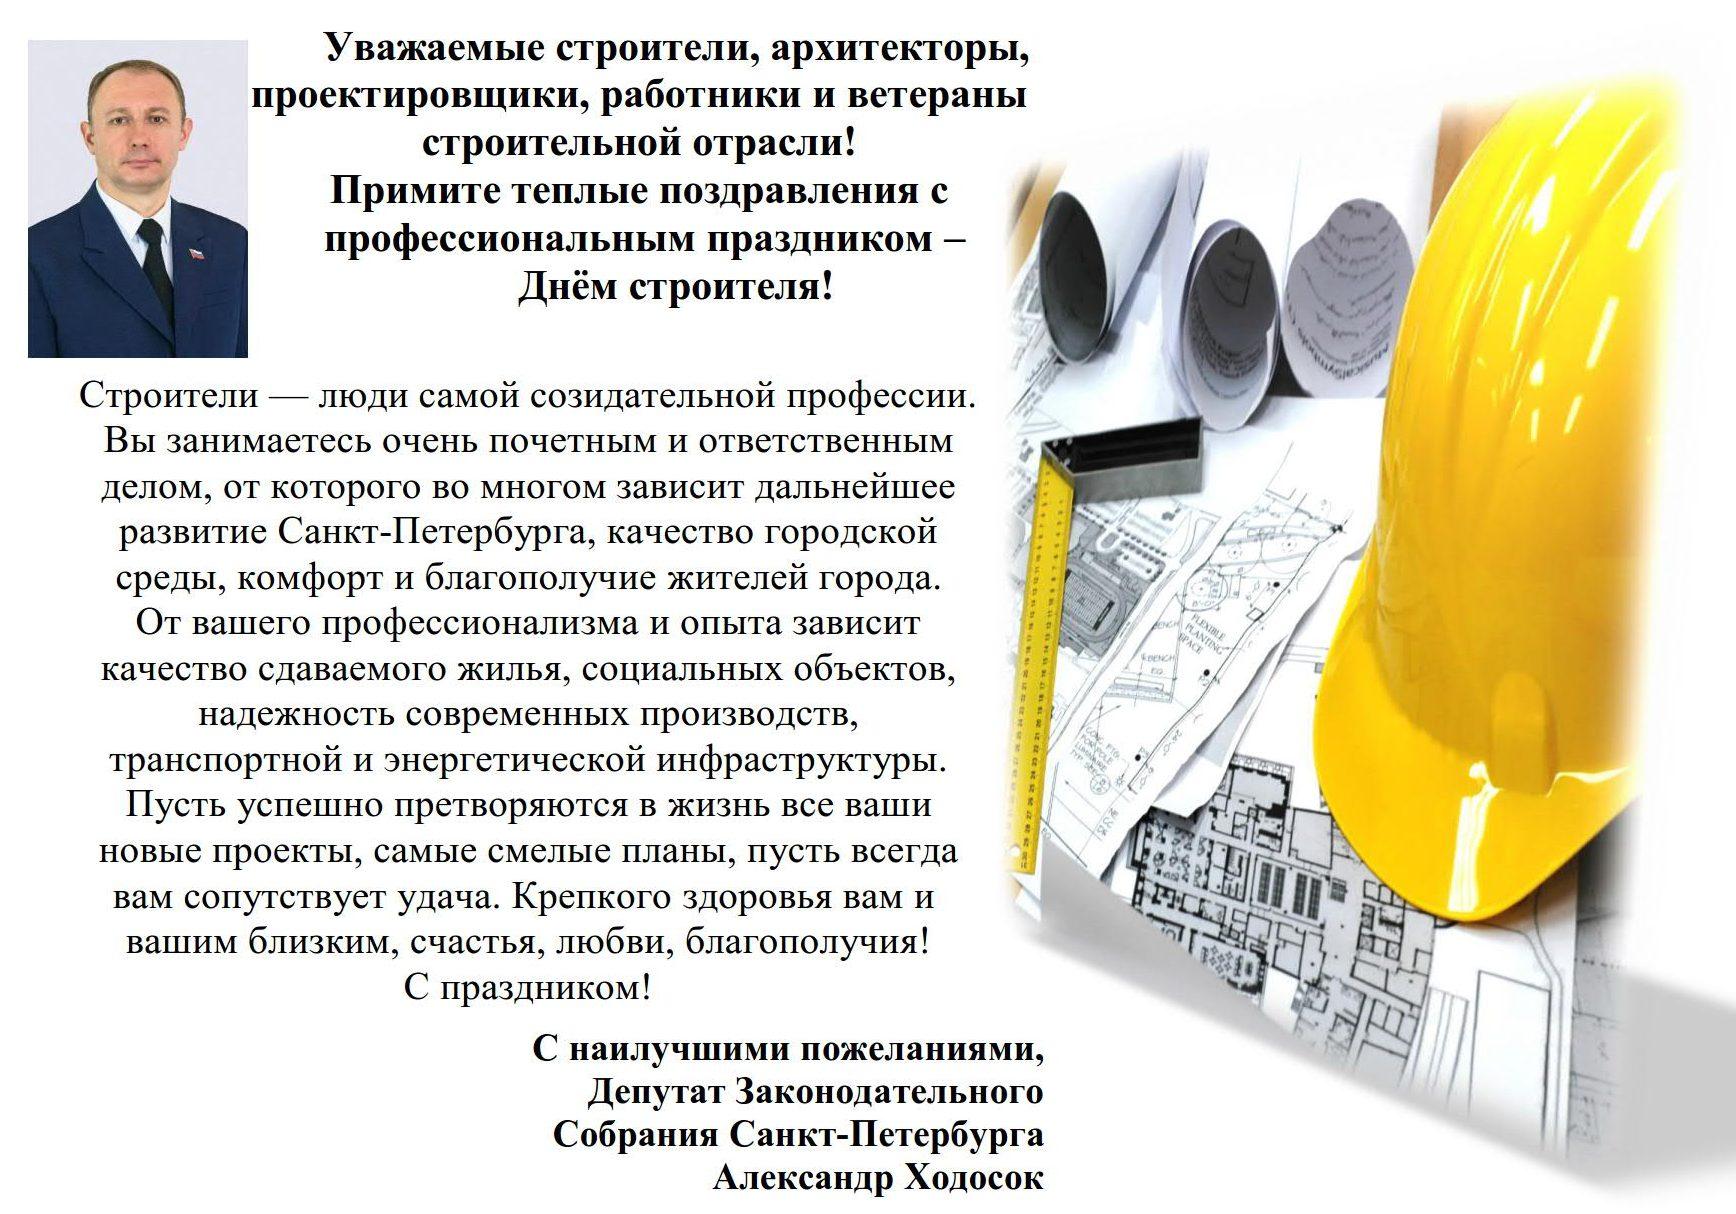 ПОЗДРАВЛЕНИЕ А.В. Ходоска с днем строителя_1